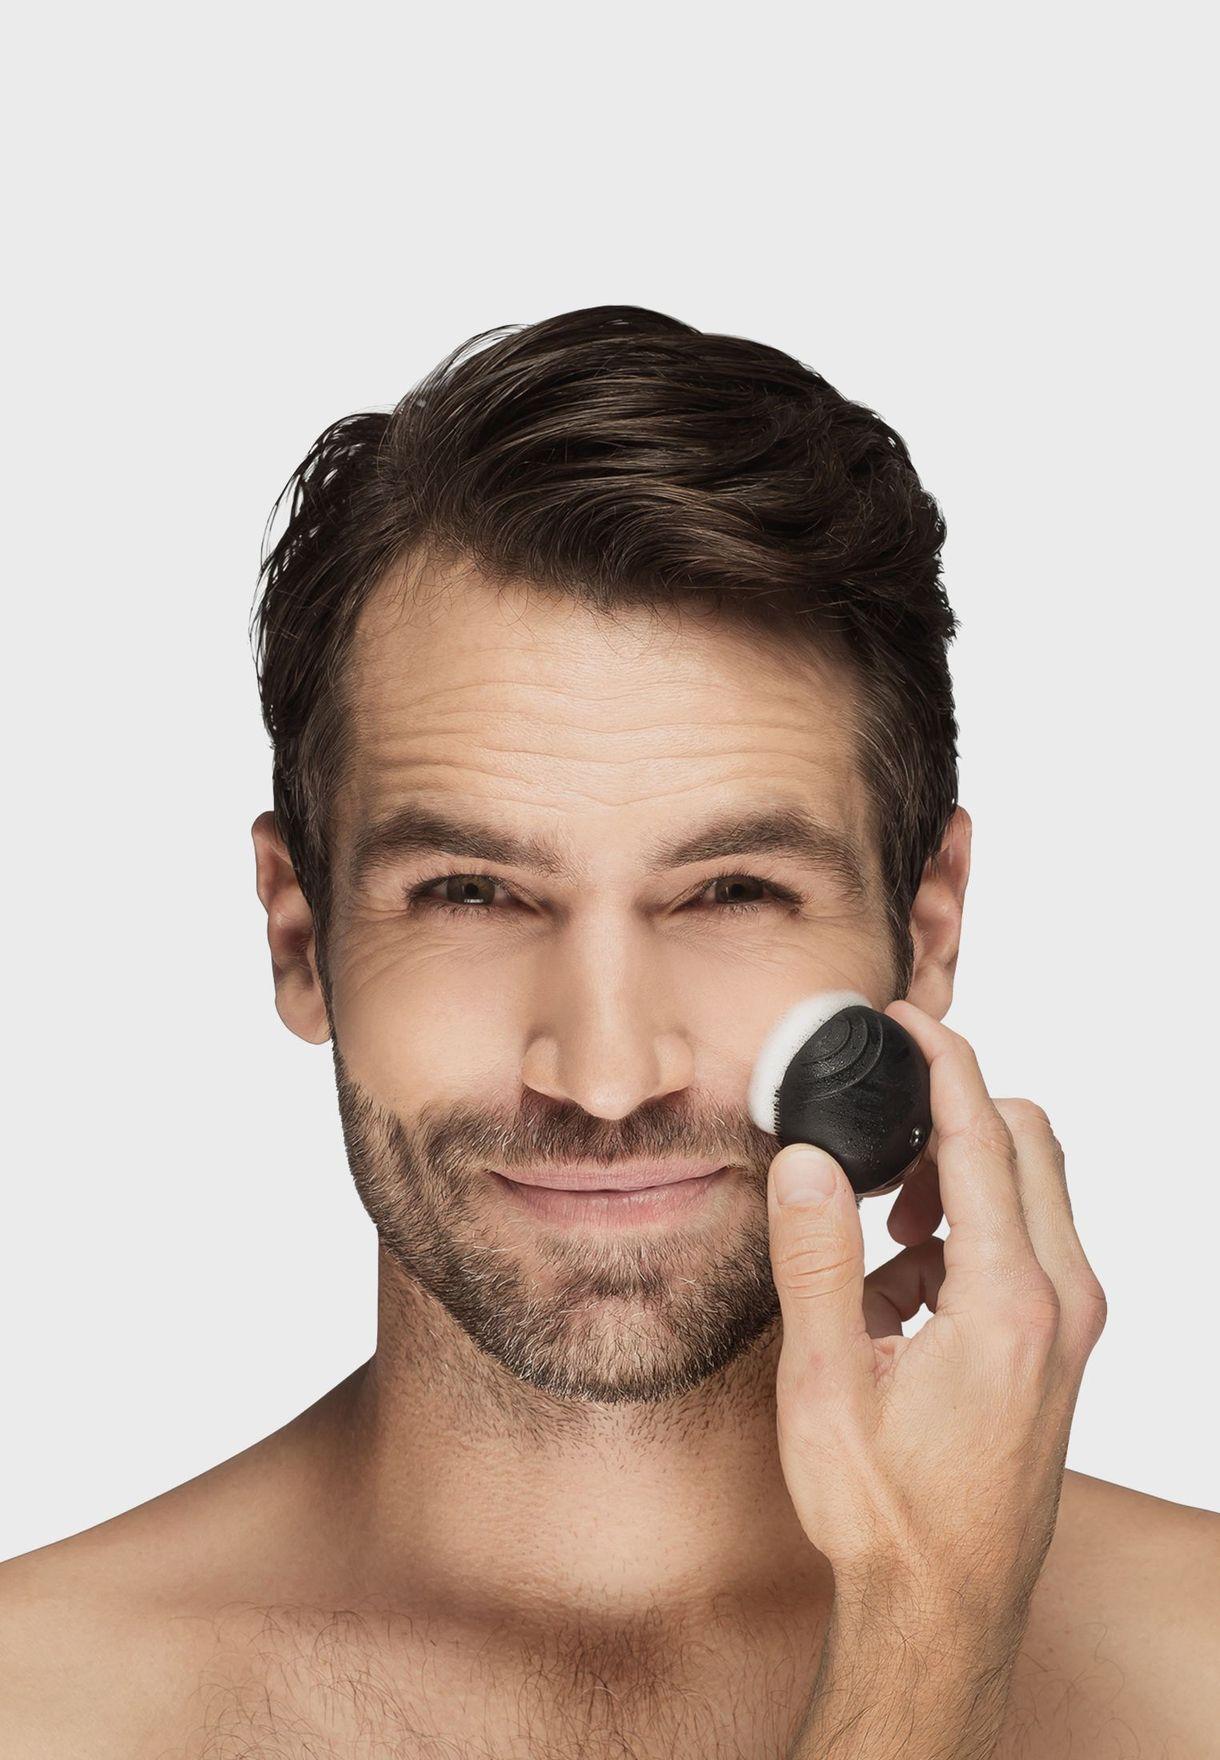 LUNA go Facial Cleansing Brush for Men